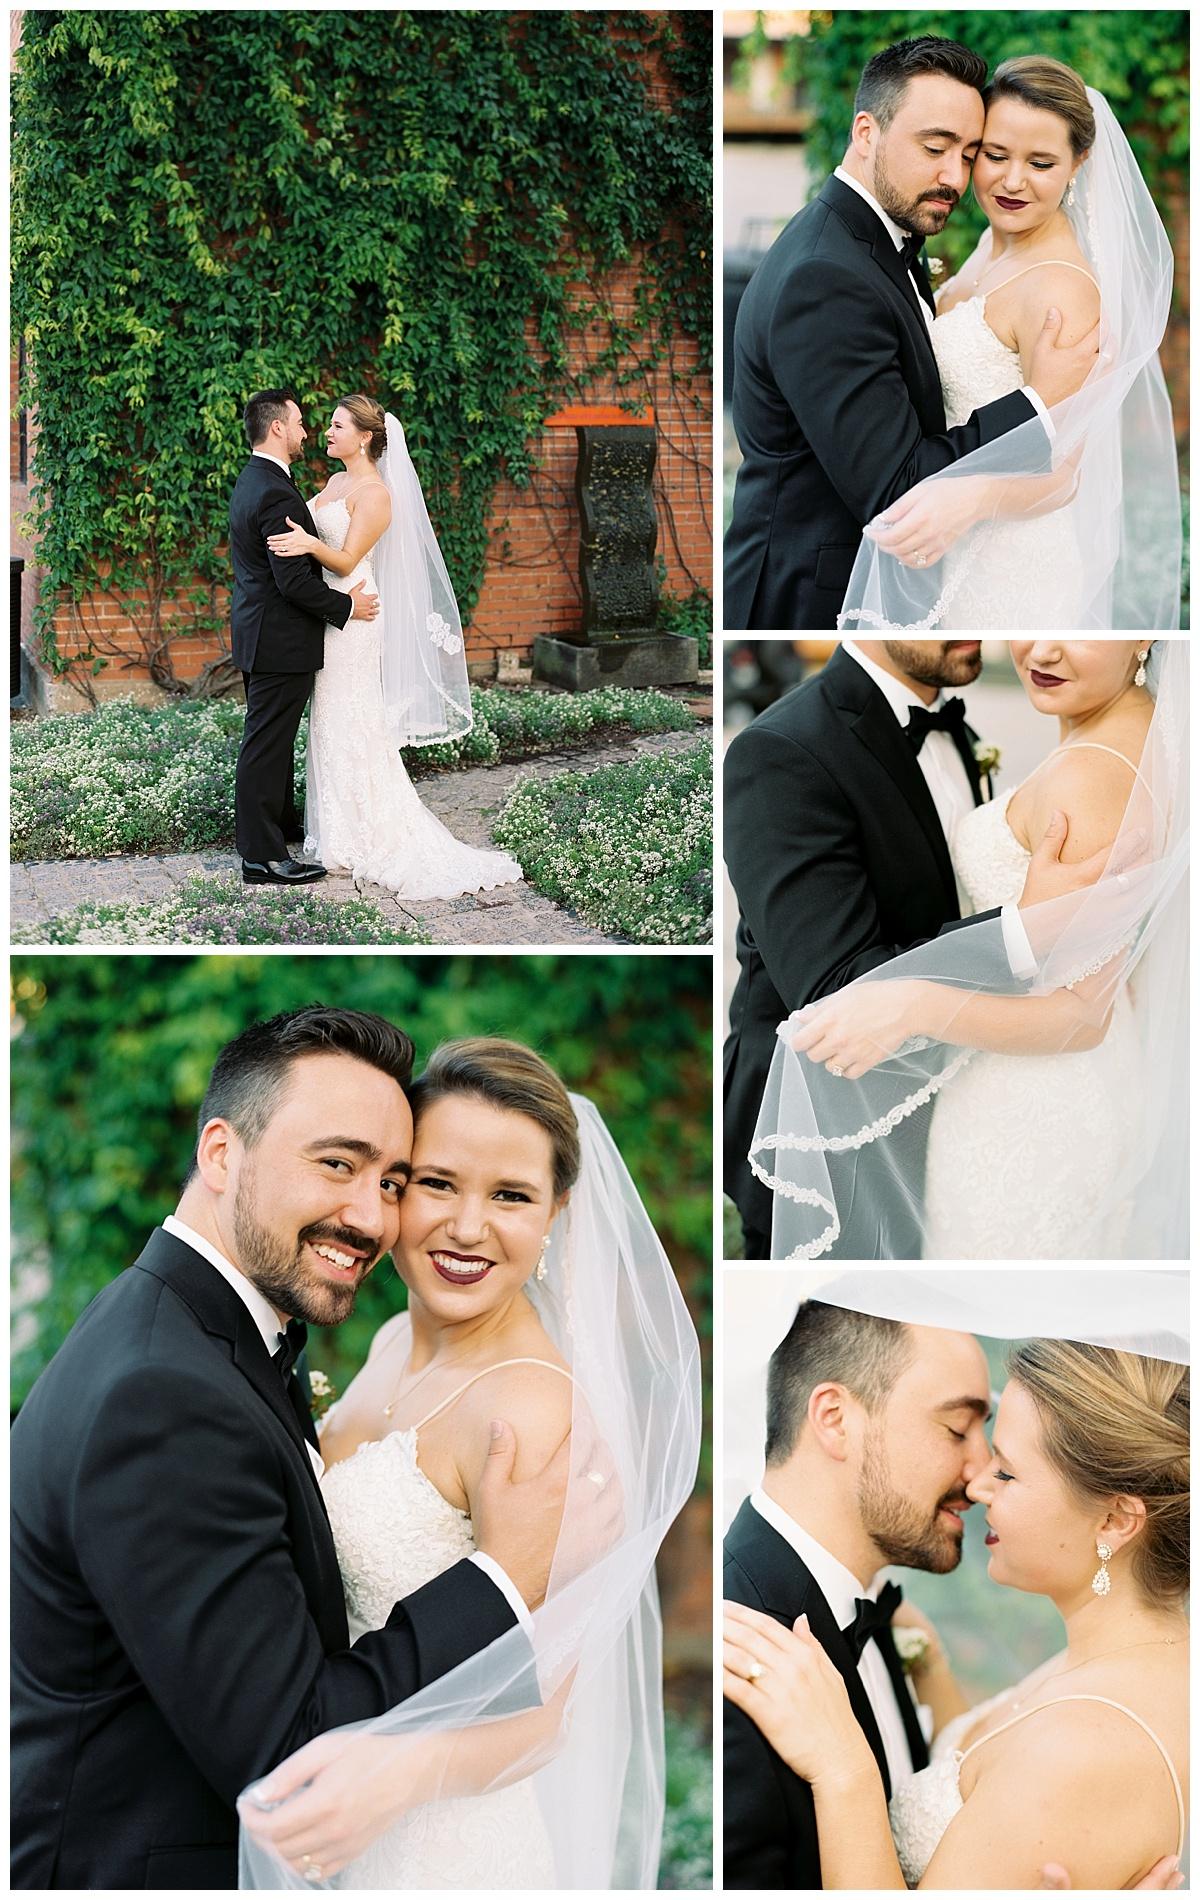 hickory-stree-annex-wedding-ar-photography-nicole-nolan-15.jpg